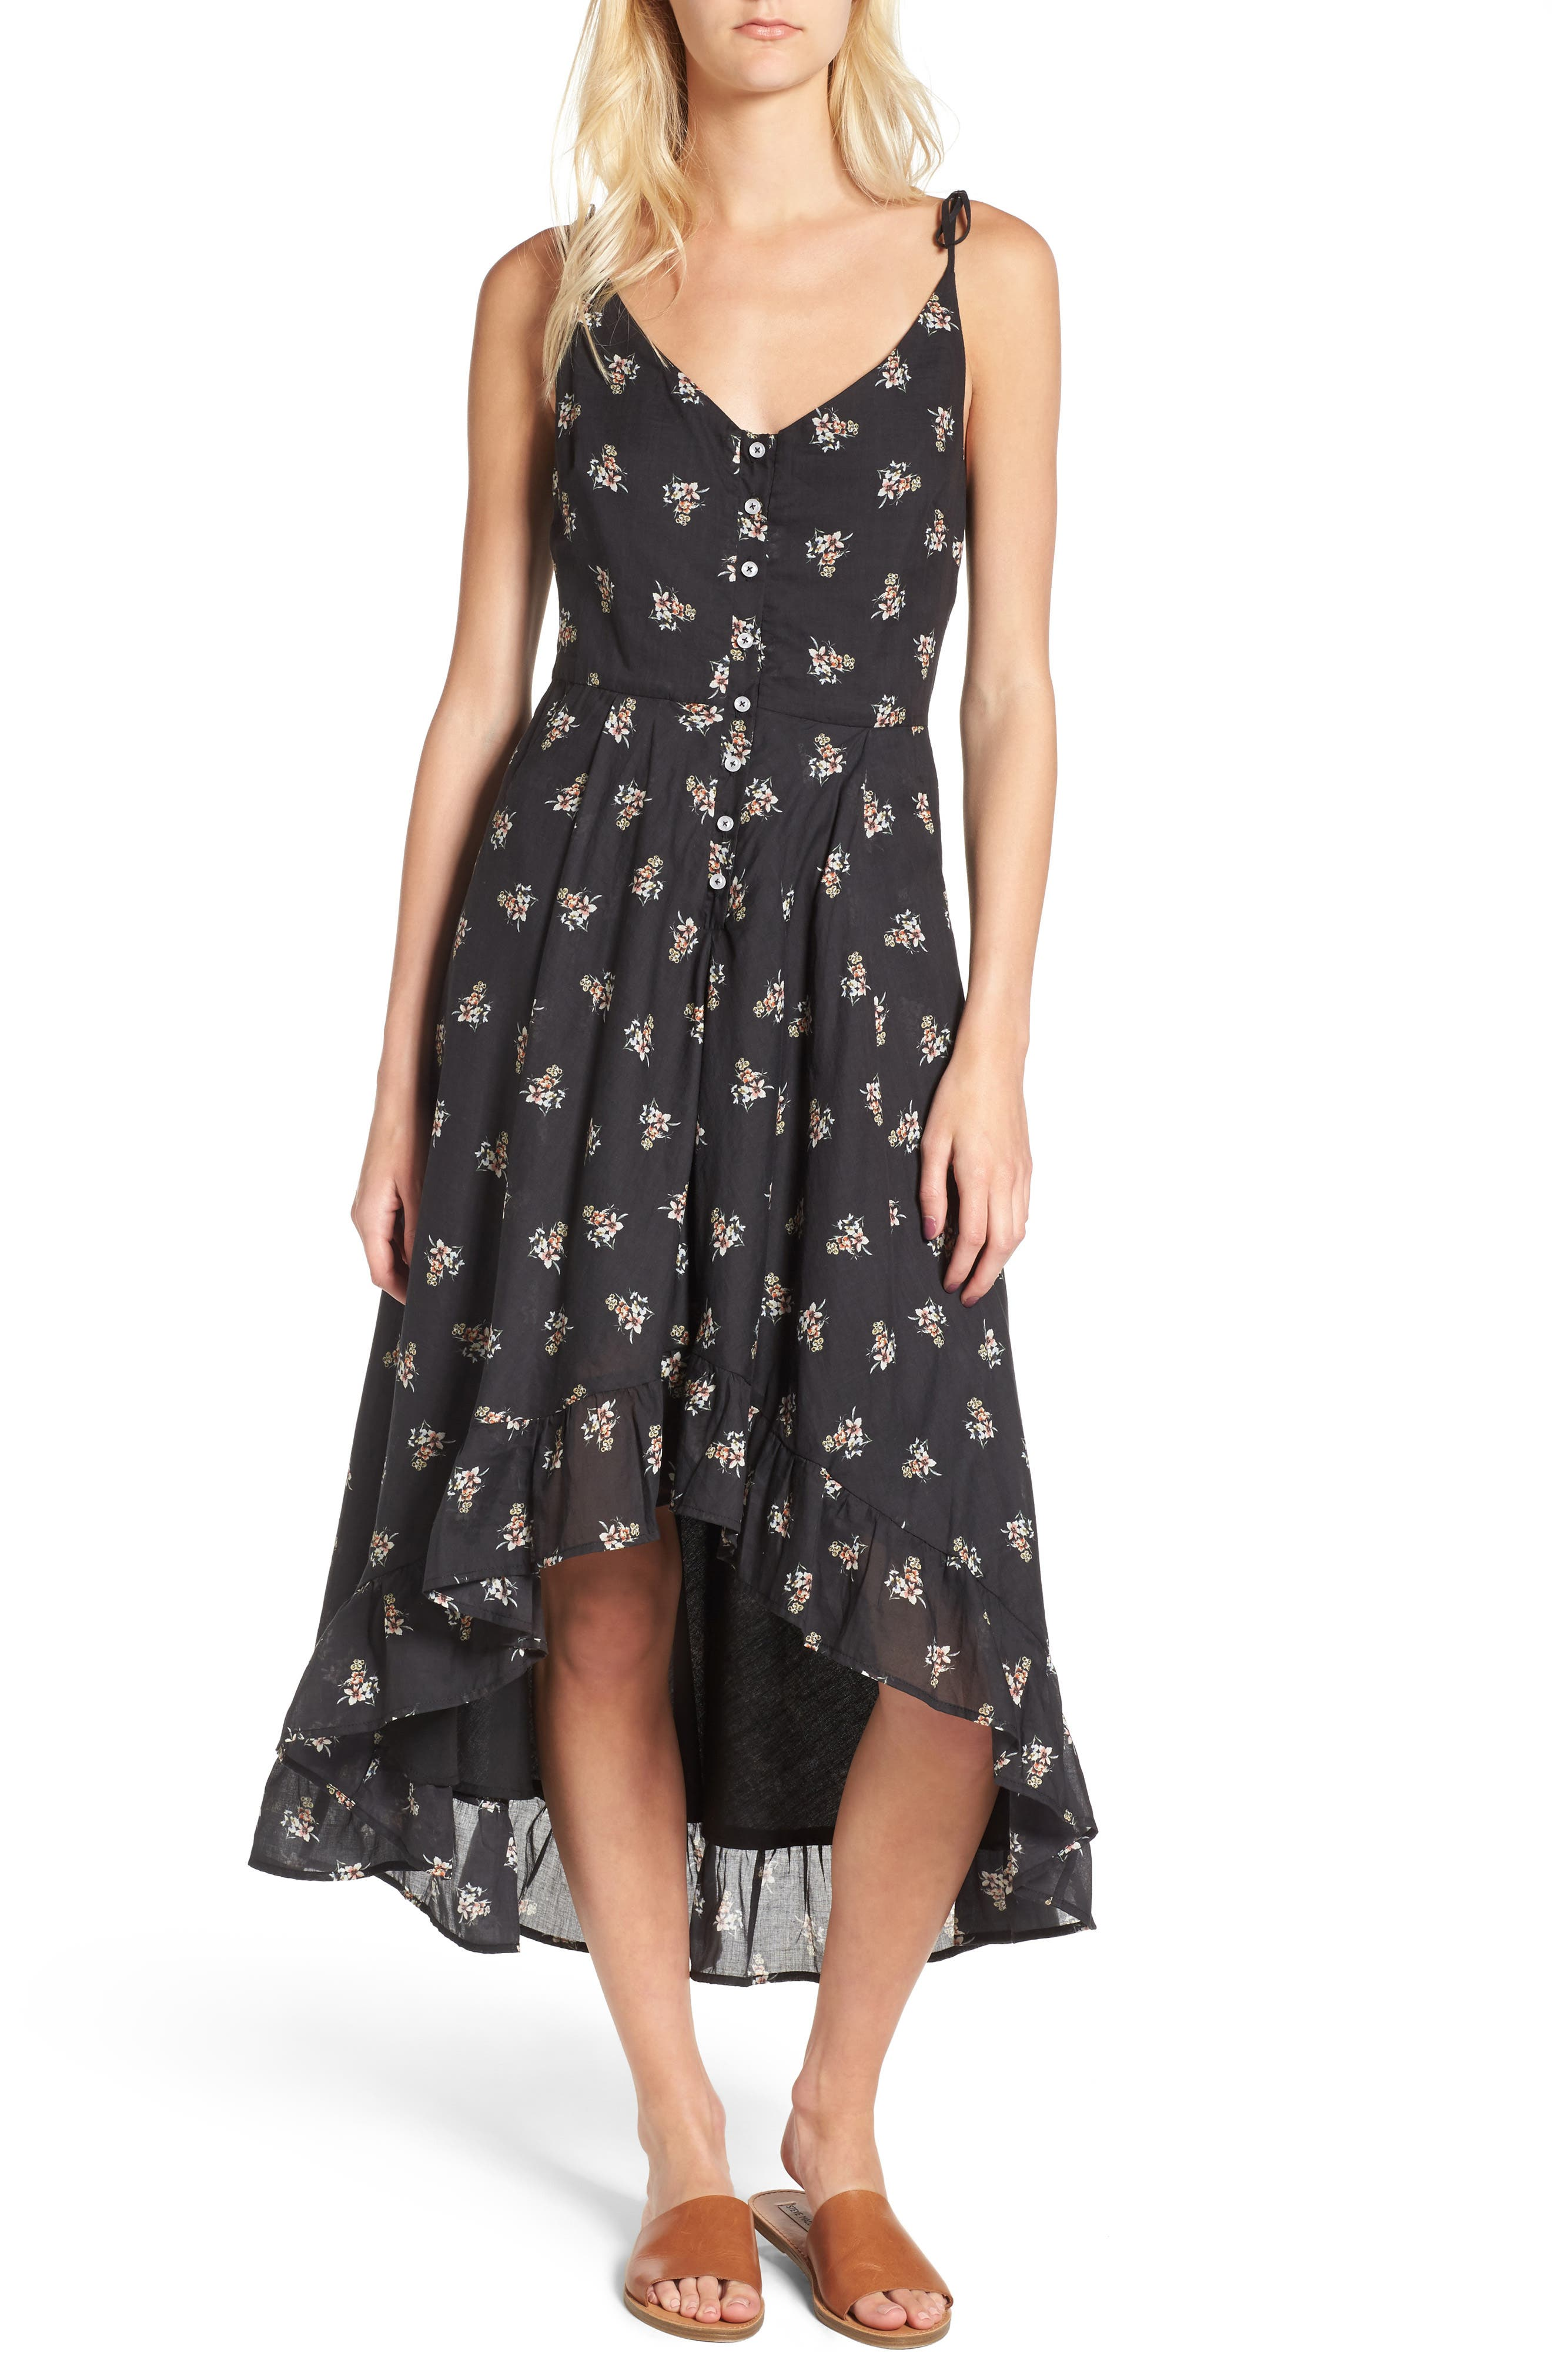 Regal Midi Dress,                             Main thumbnail 1, color,                             001